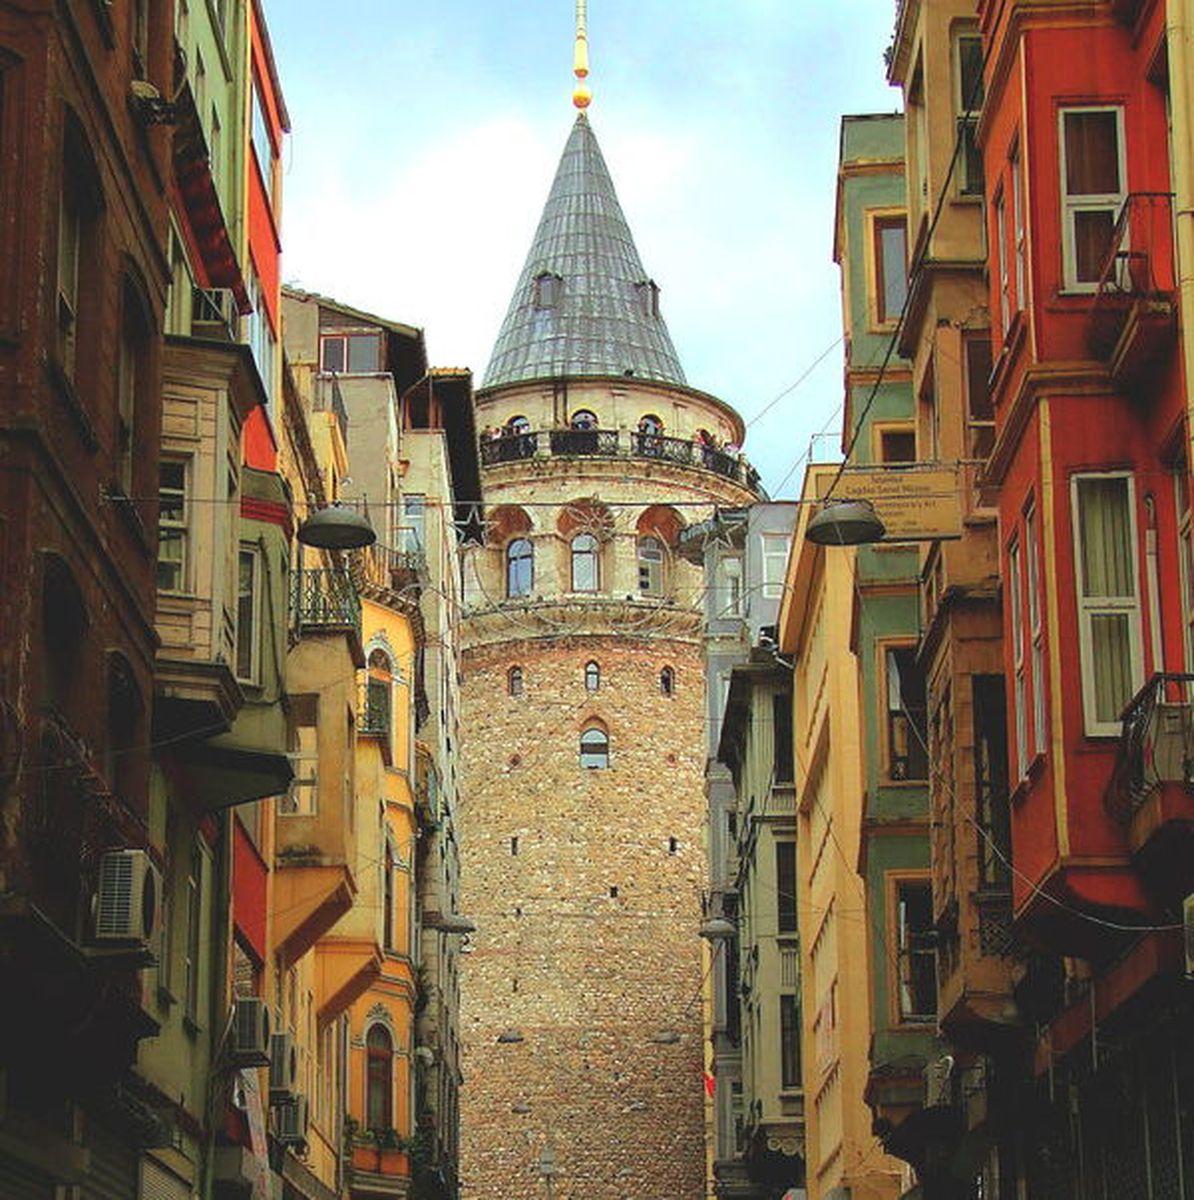 منطقهی گالاتا در استانبول